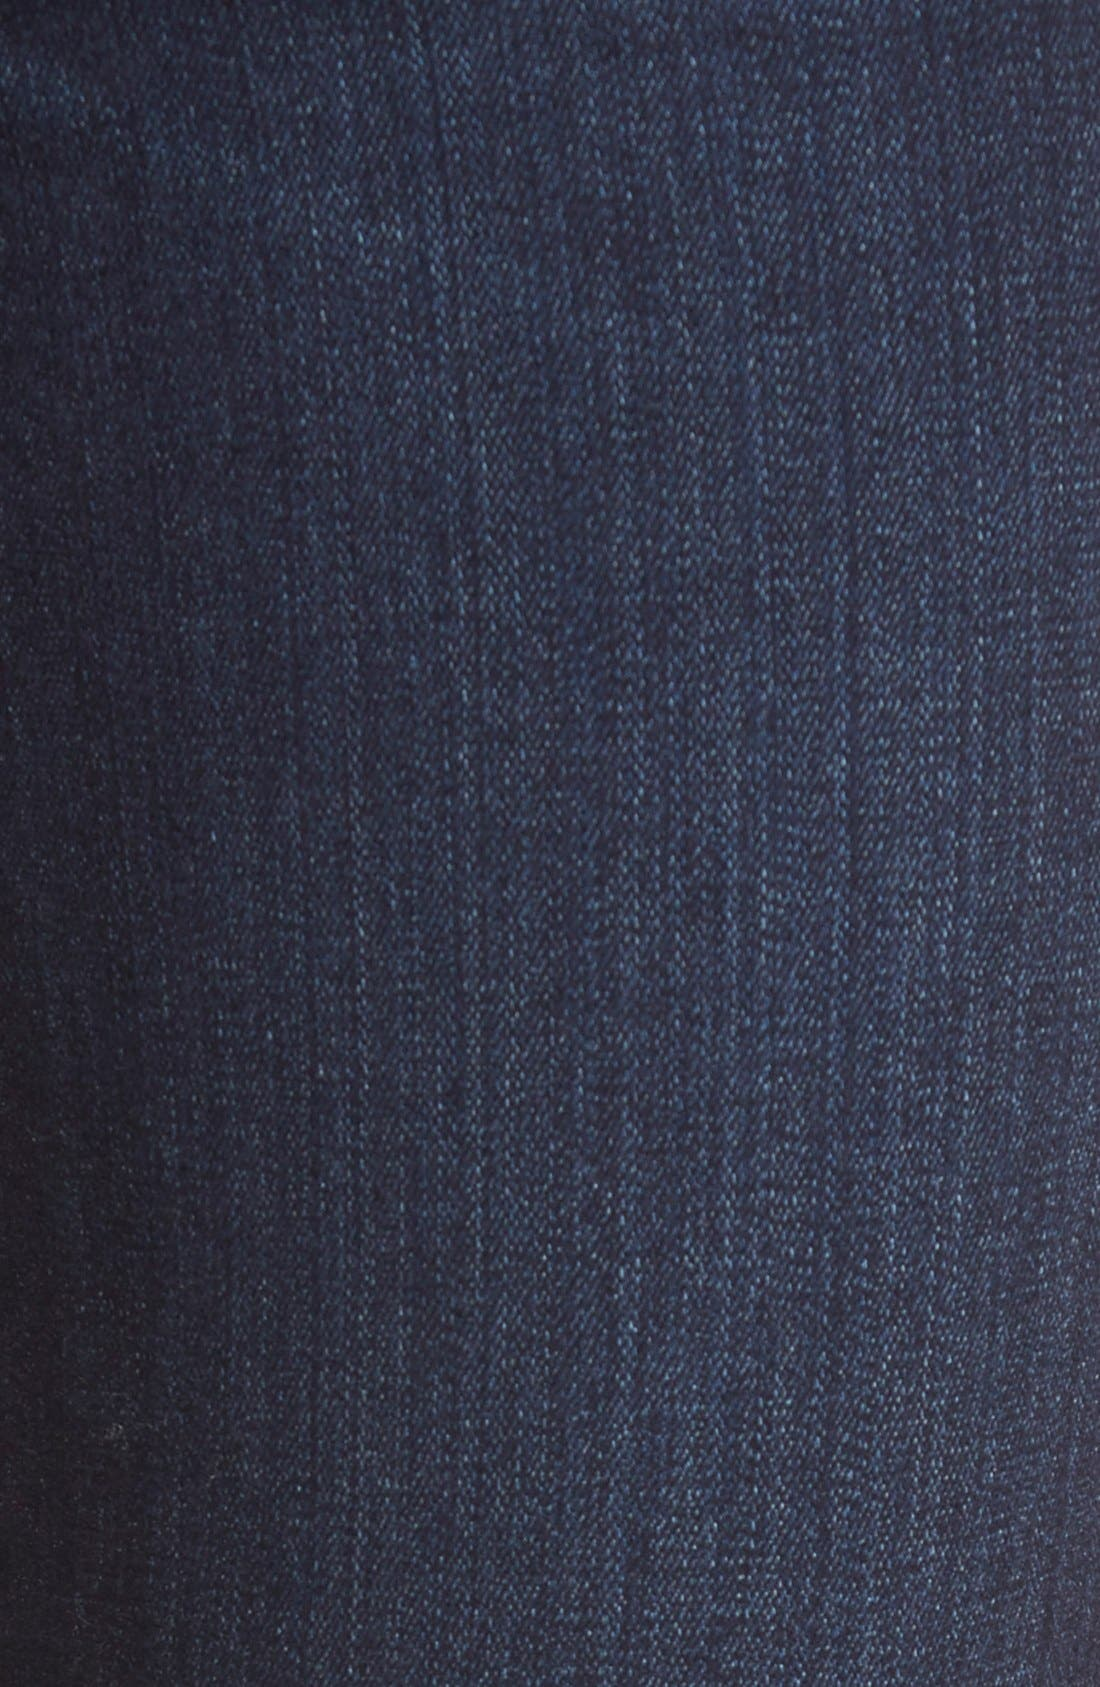 Transcend - Verdugo Ultra Skinny Jeans,                             Alternate thumbnail 11, color,